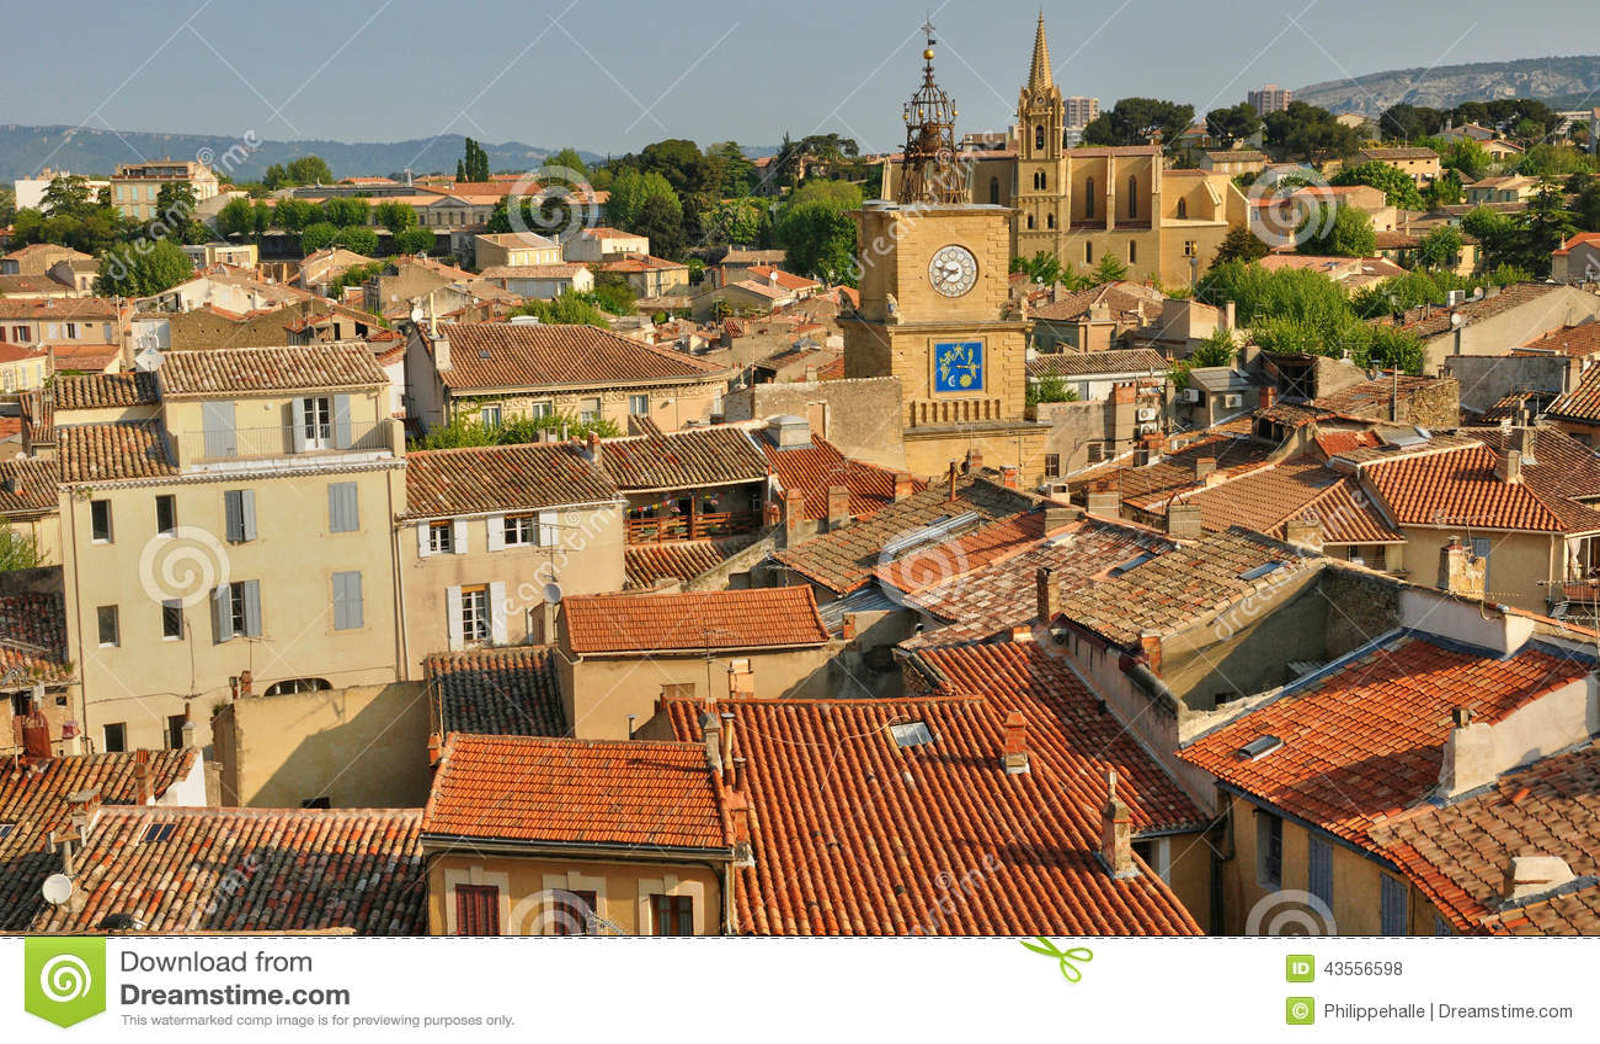 Frankrijk bouche du de rh ne stad van salon de provence redactionele stock foto afbeelding - Electricien salon de provence ...